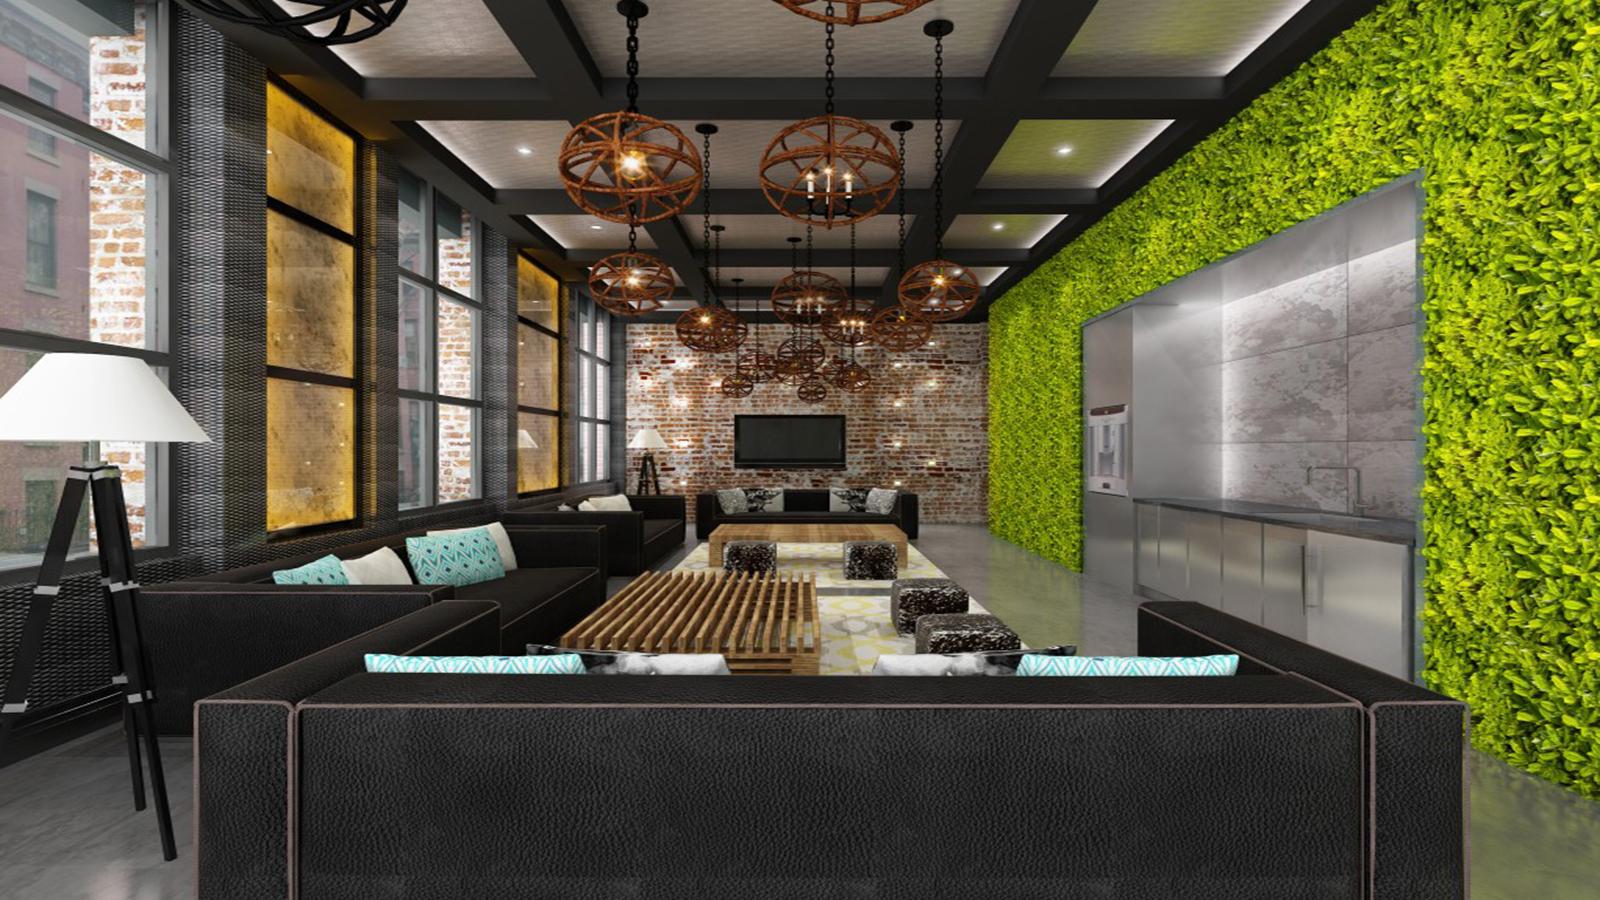 Halo LIC, 44-41 Purves Street, NYC - Rental Apartments